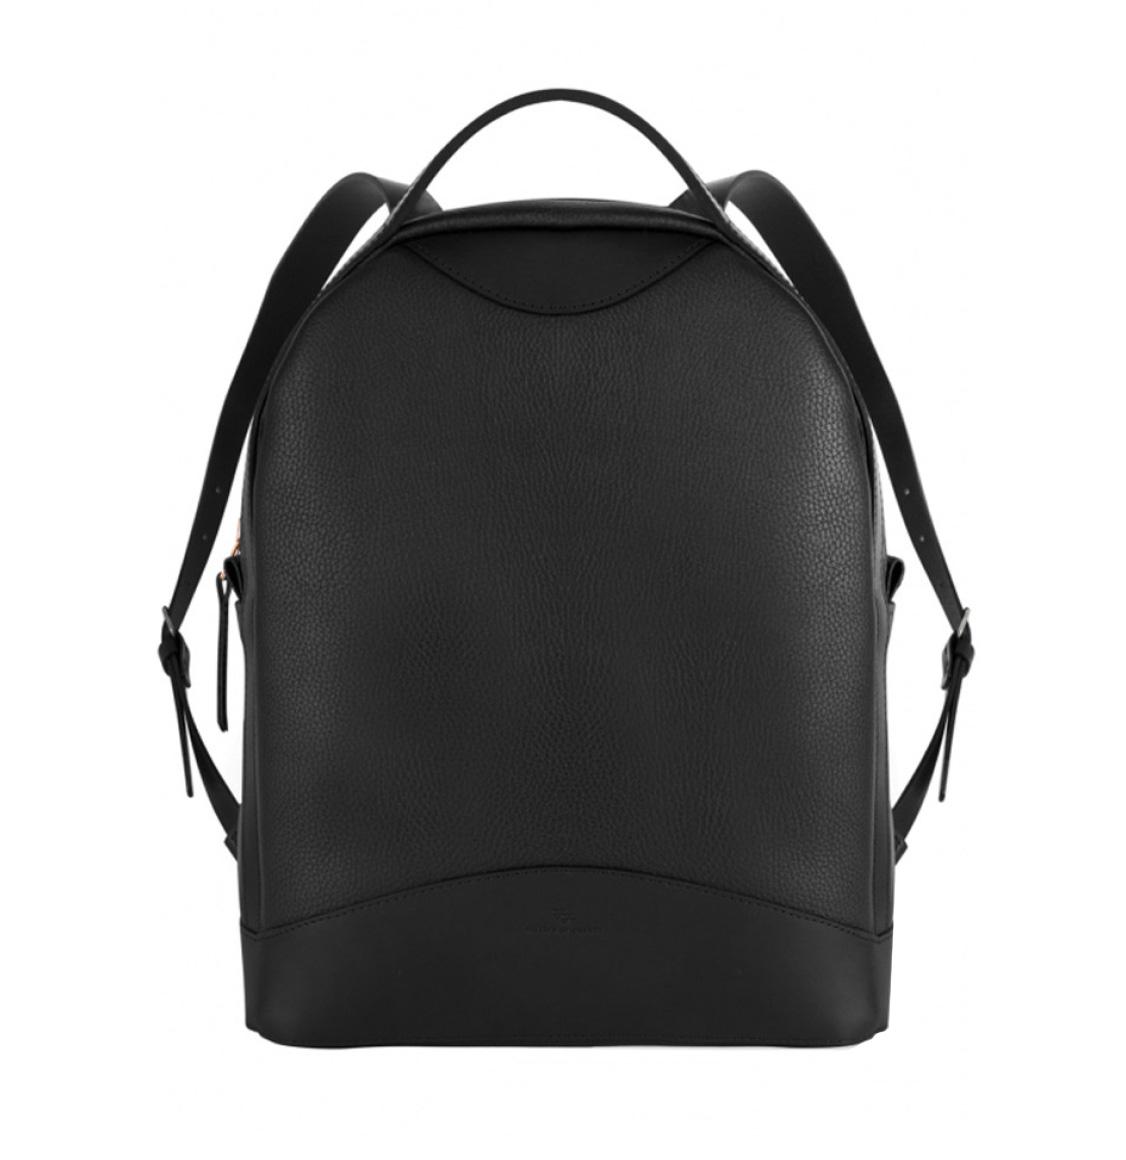 Atelier De L' Armee Voyager Pack Leather Black